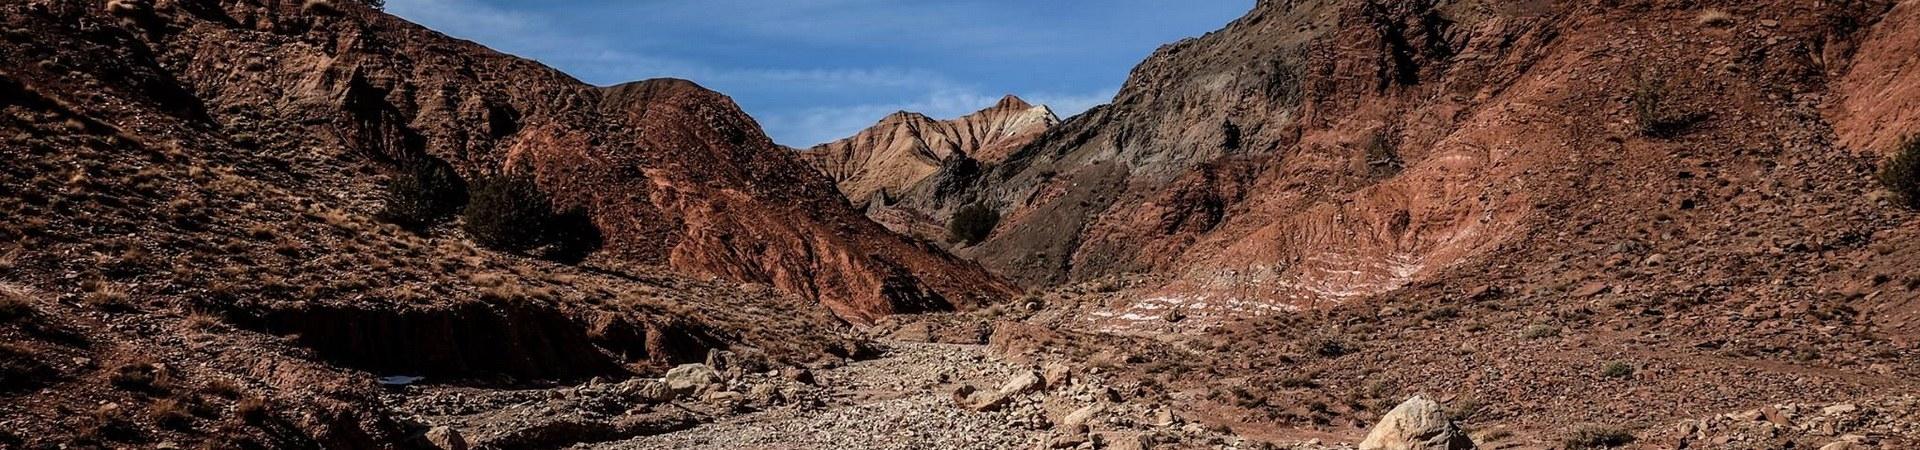 Oft führt der Weg entang trockener Wadis